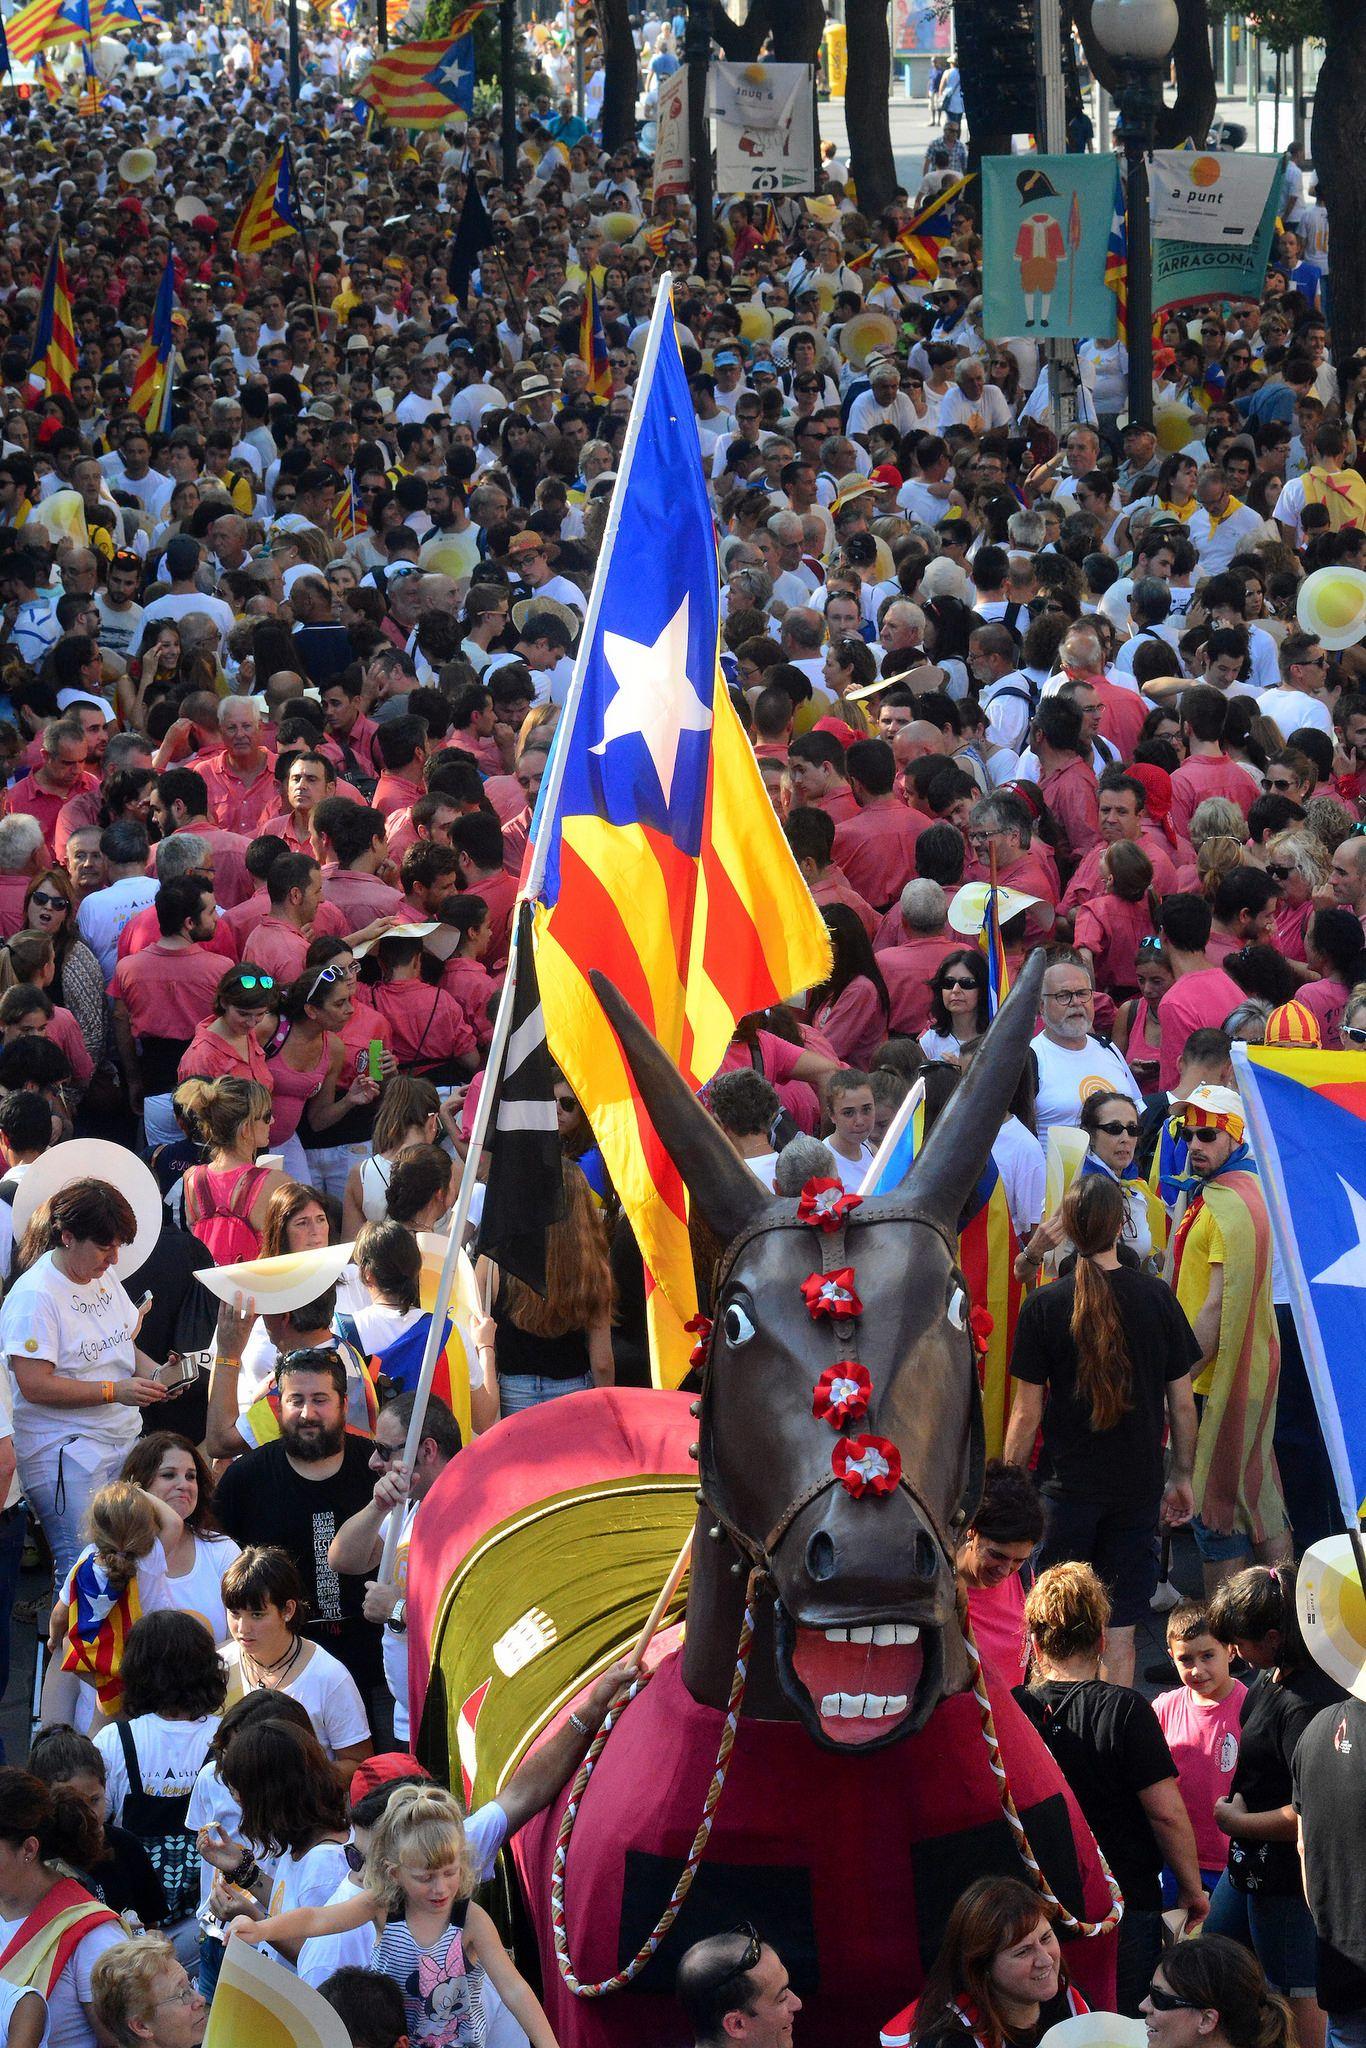 Diada 2016 a Tarragona. Catalonia Fotos: Francesc Bofarull